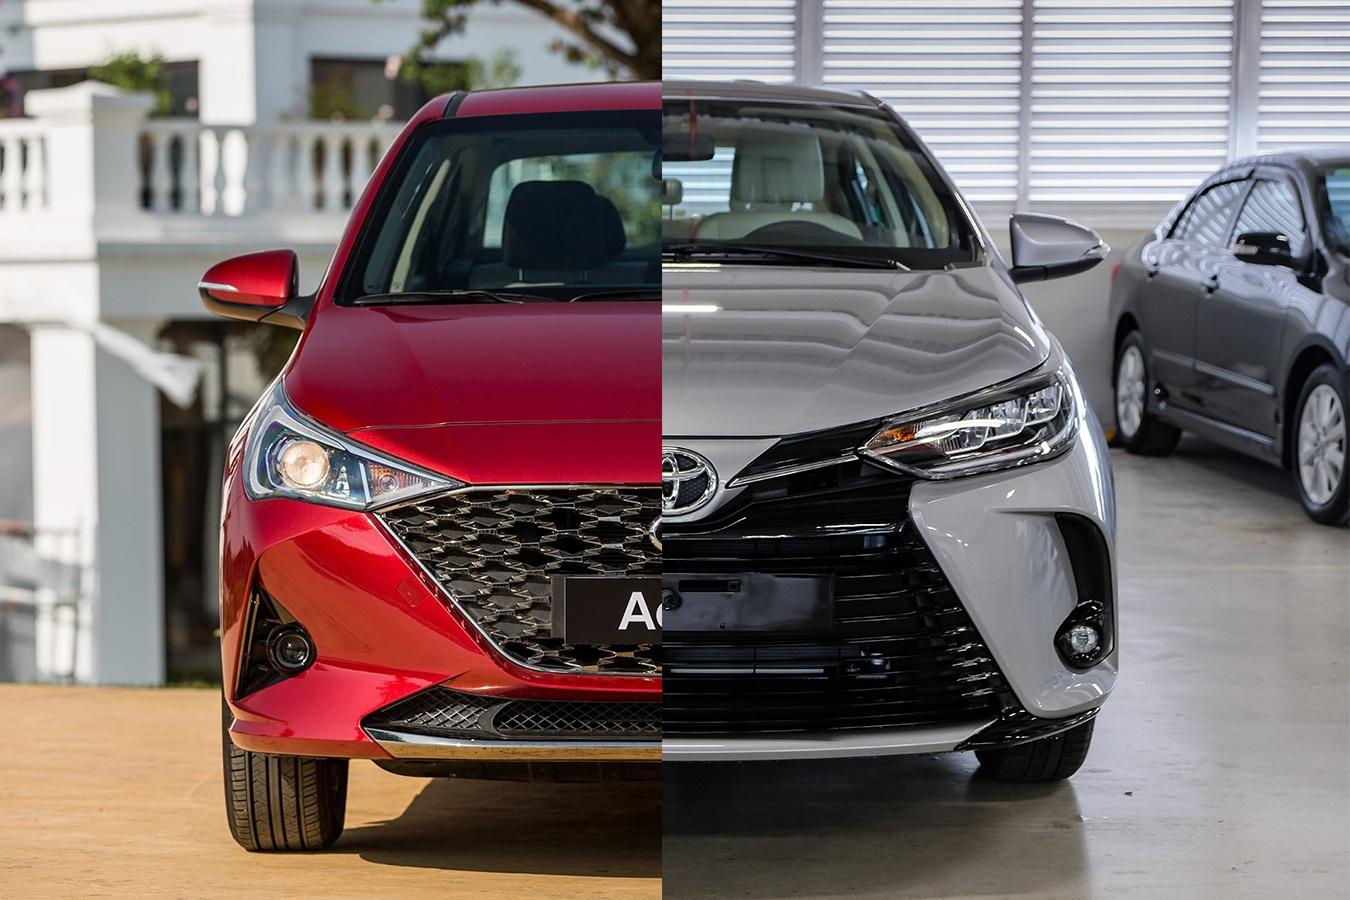 so sanh Hyundai Accent va Toyota Vios 2021 anh 1